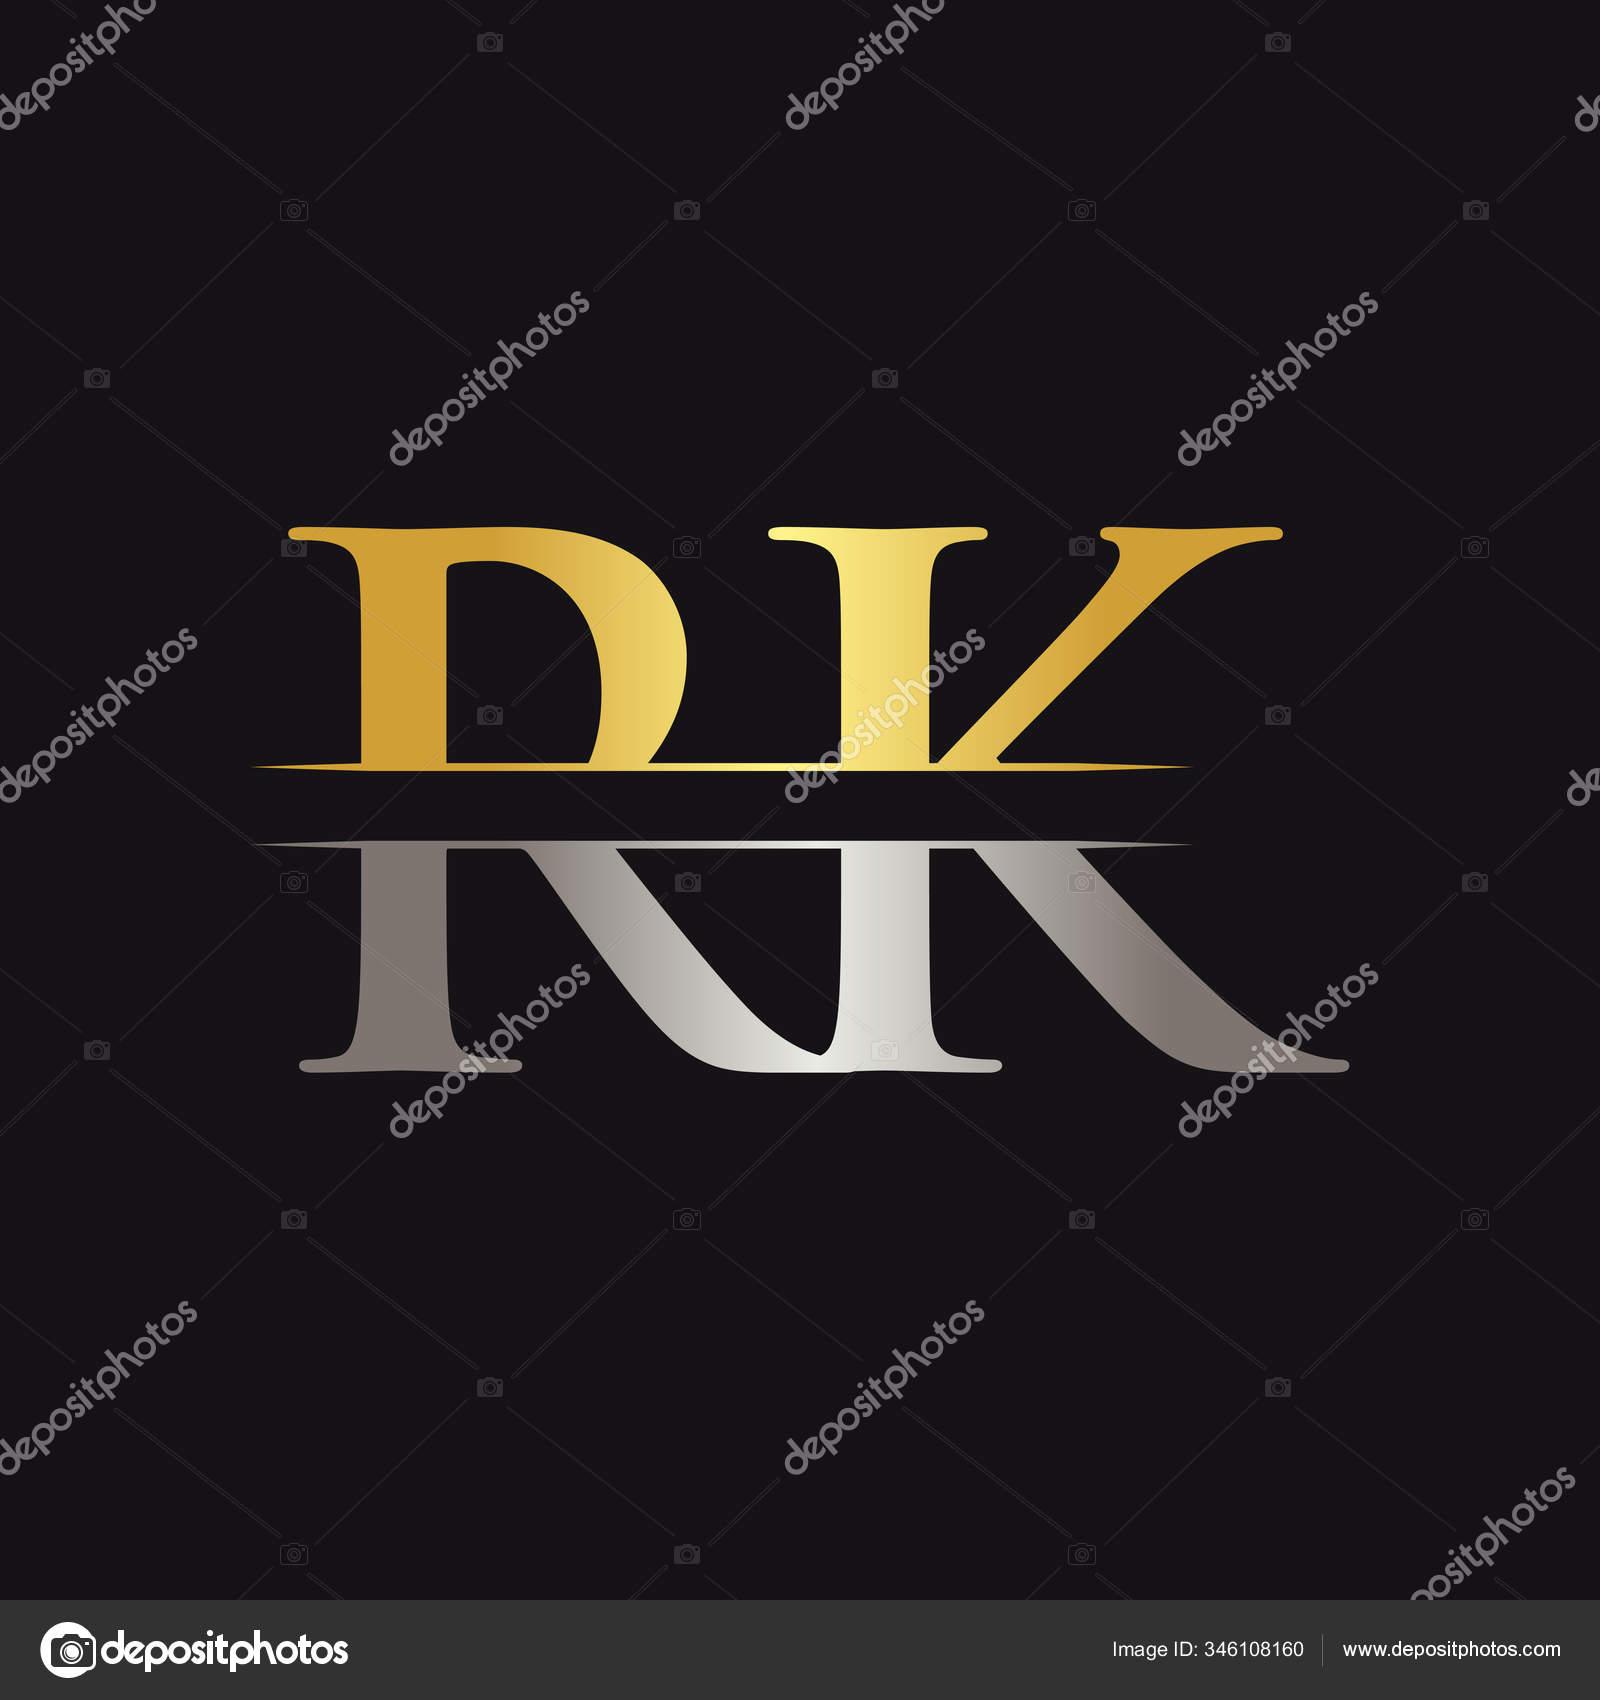 ᐈ Art Png Stock Pics Royalty Free Rk Logo Wallpapers Download On Depositphotos